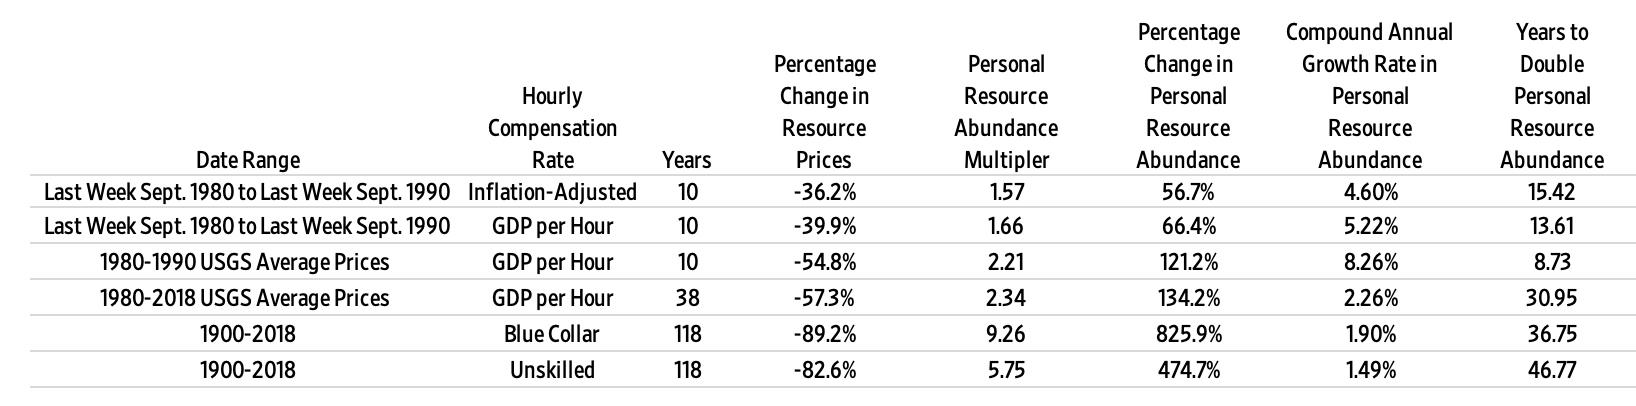 Personal Resource Abundance